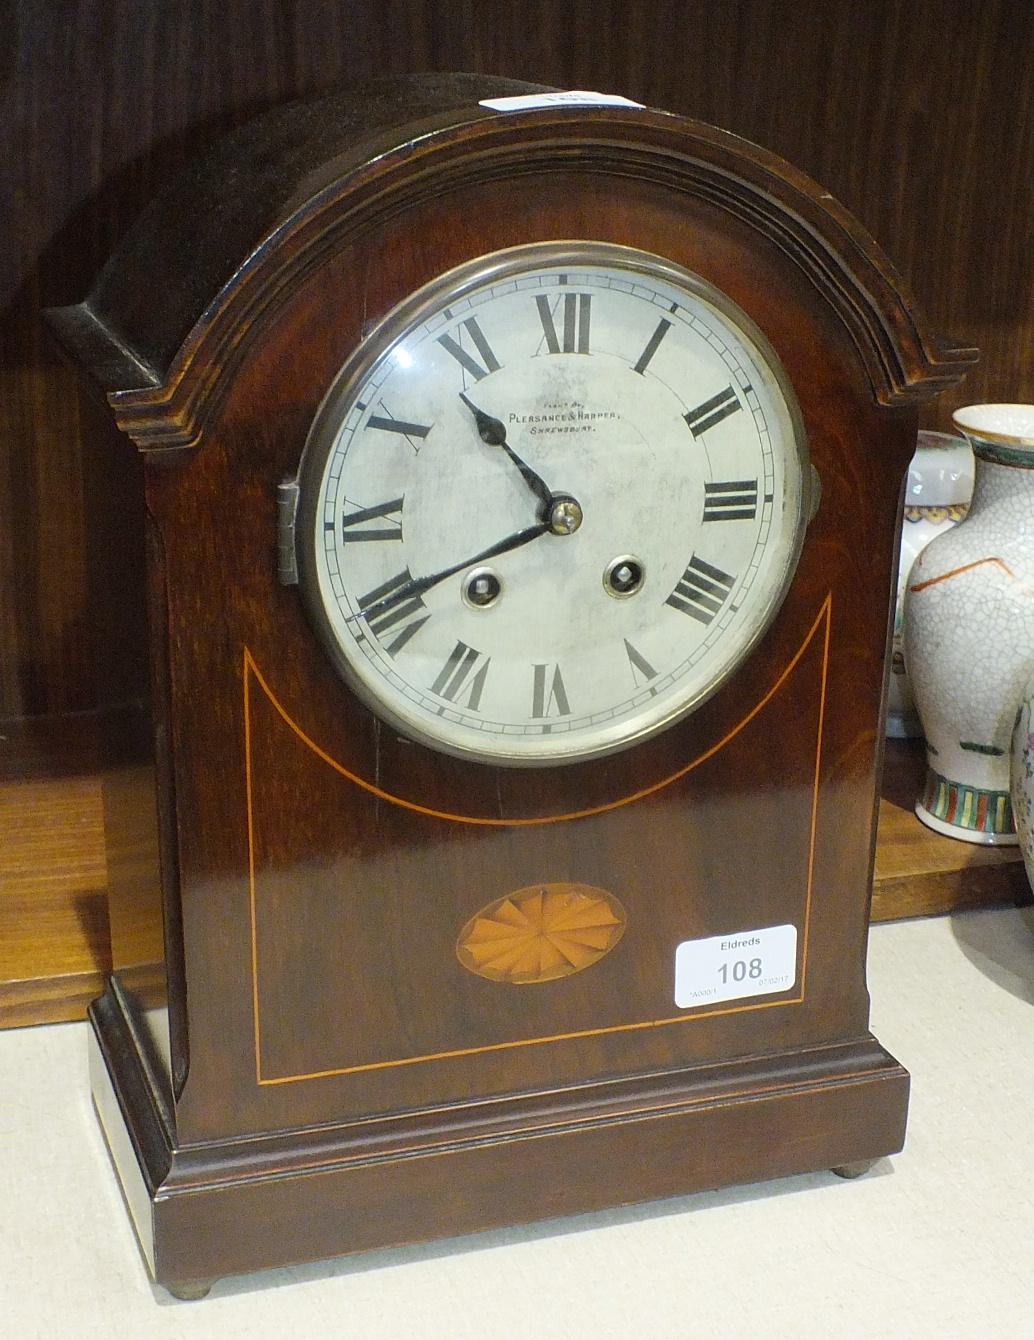 Lot 108 - An Edwardian dome-top mahogany striking mantel clock by the Hamburg American Clock Co, 32cm high,